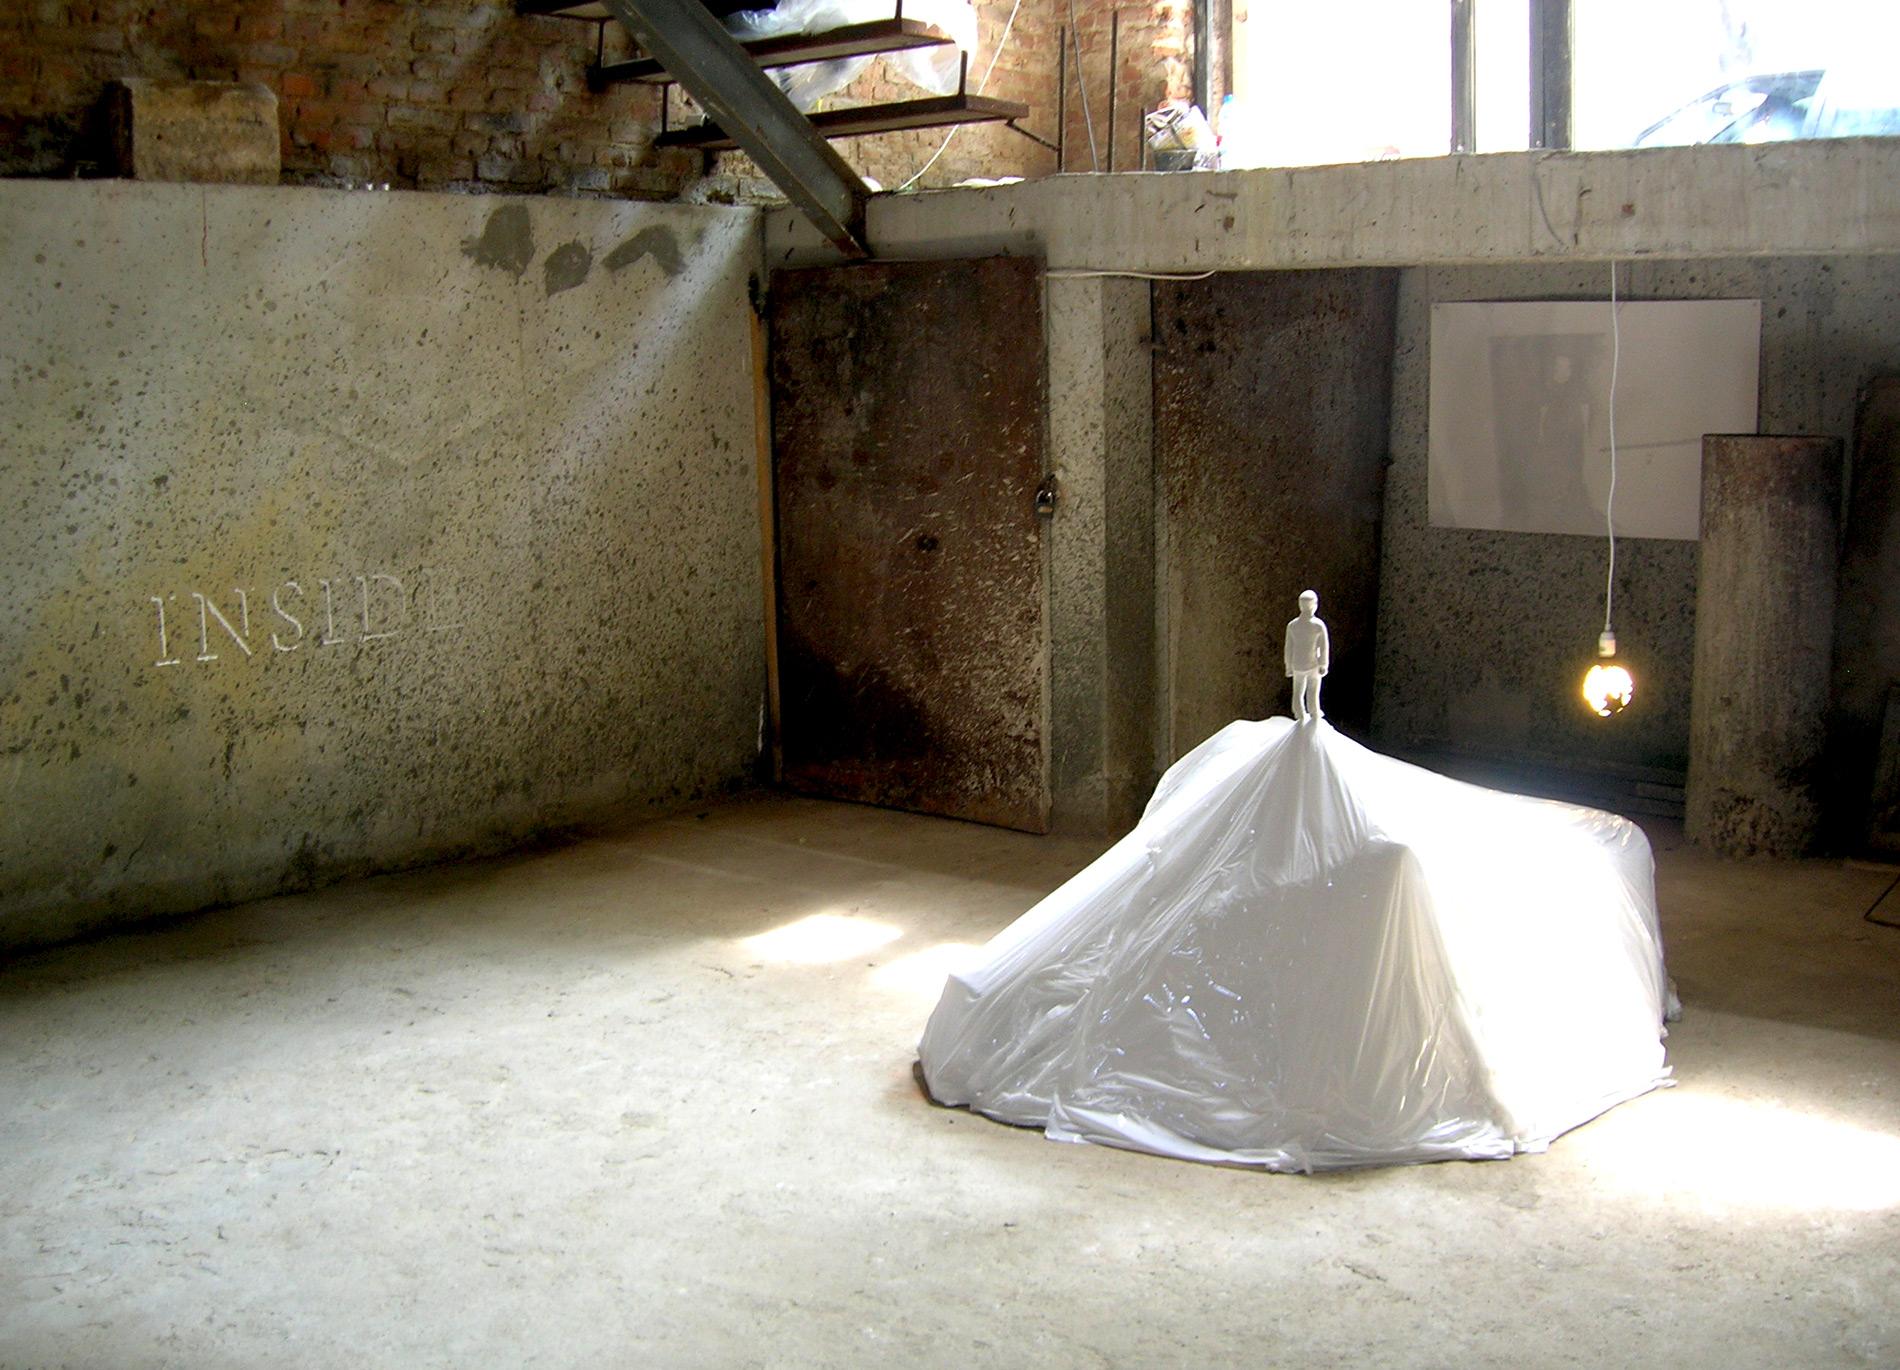 Michael Göbel - Melting Point, 2007